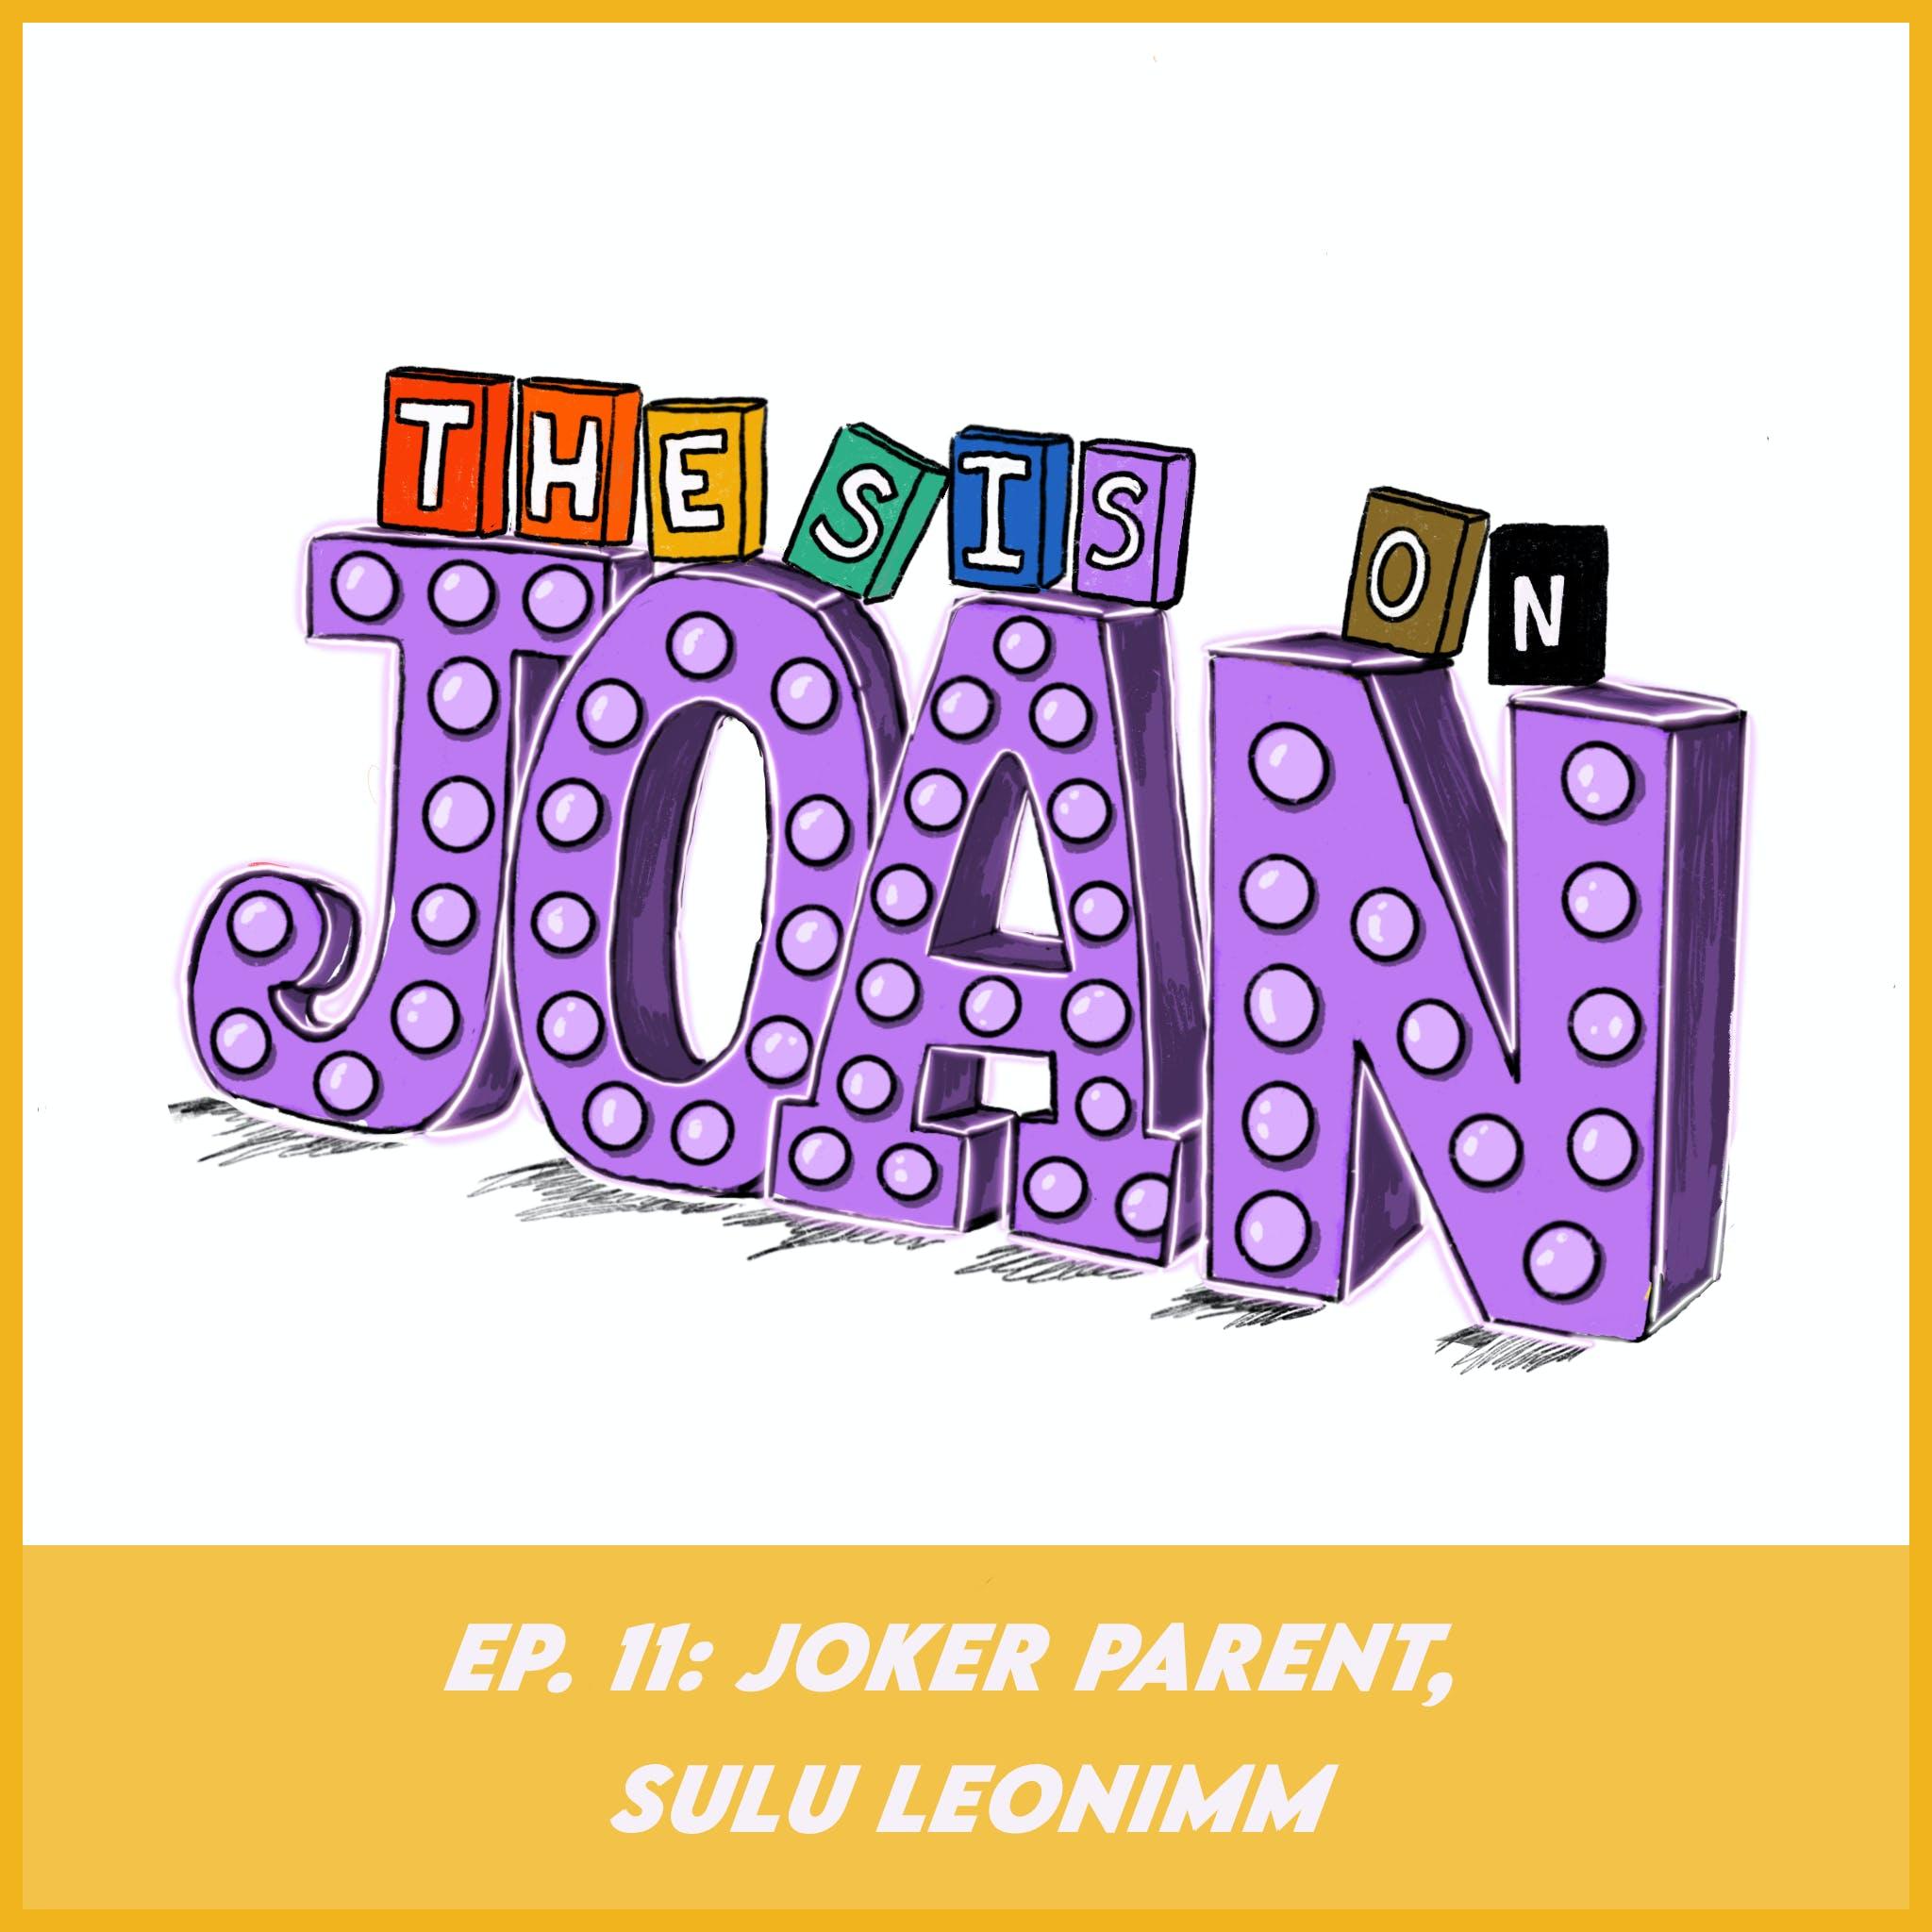 #11 Joker Parent, Sulu LeoNimm